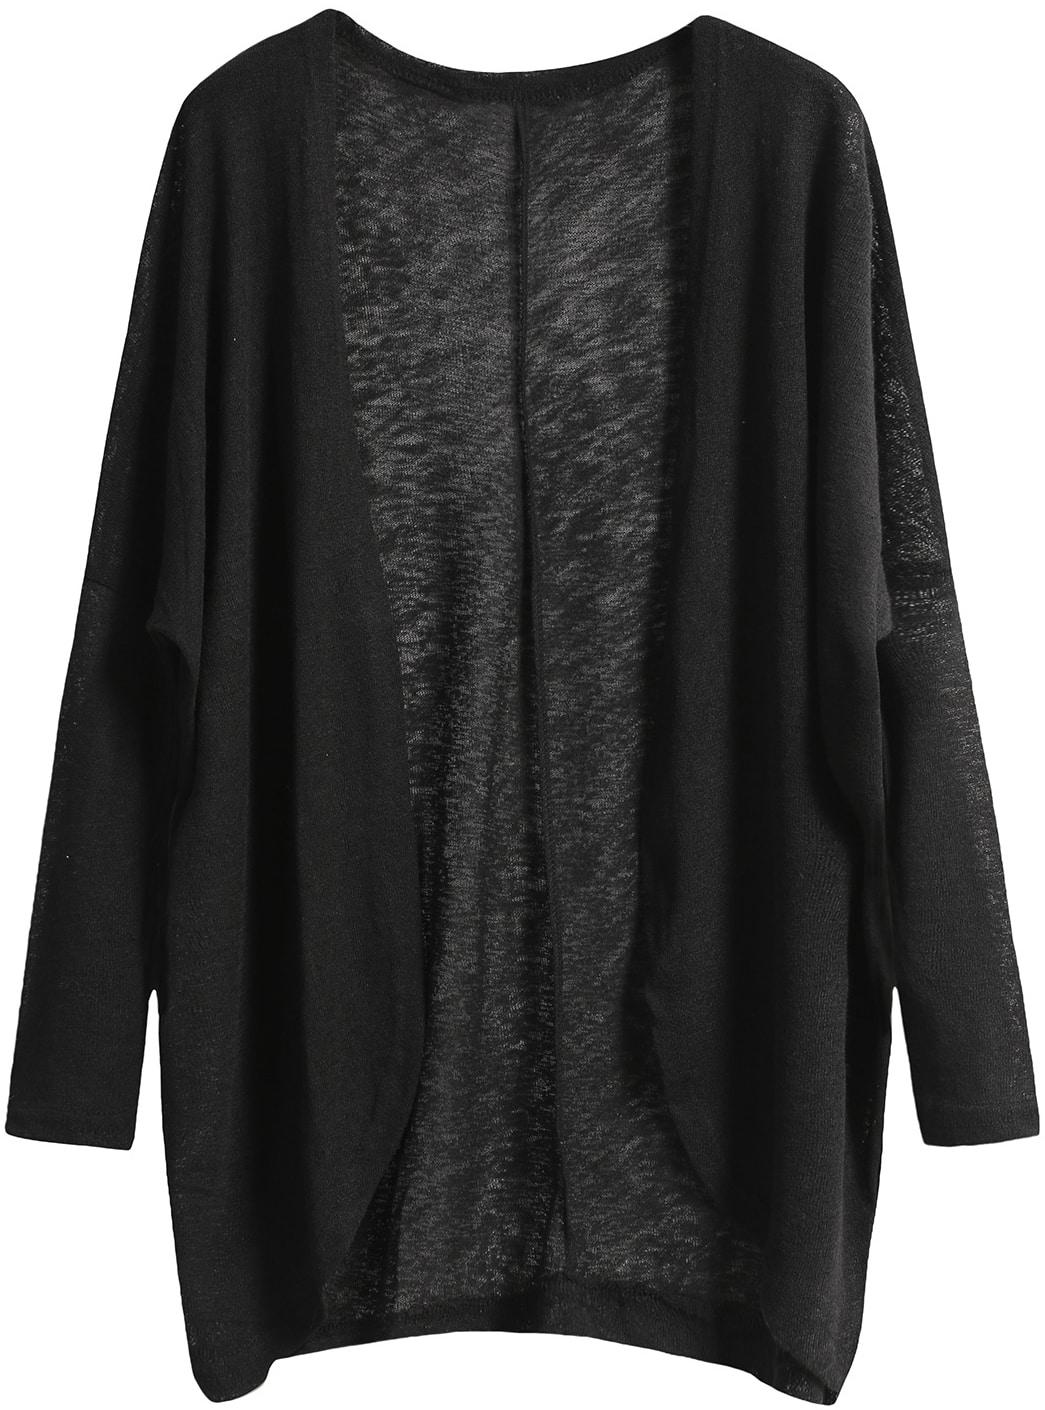 Black Long Sleeve Loose Knit Cardigan SheInSheinside